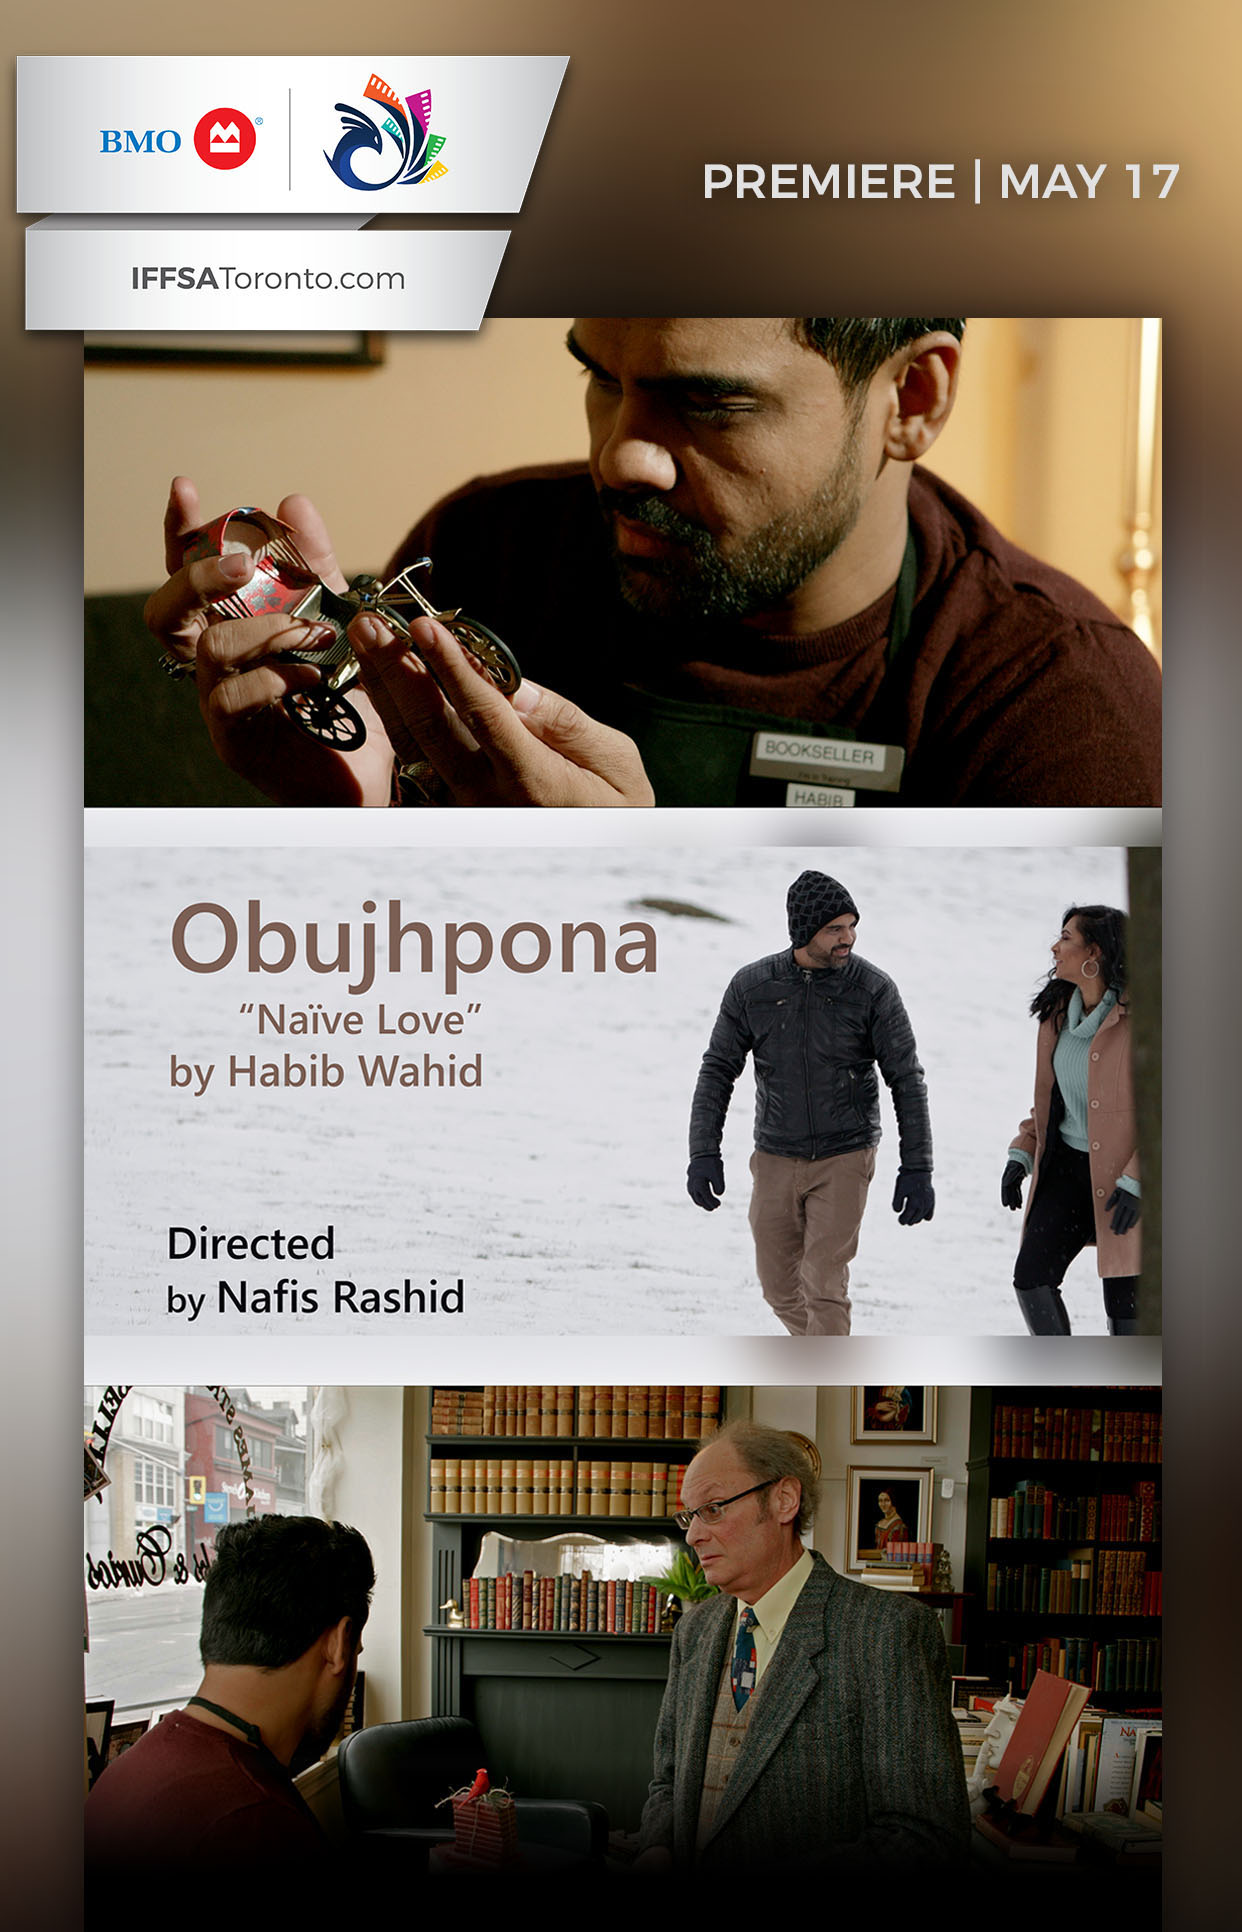 Habib Wahid - Obujhpona